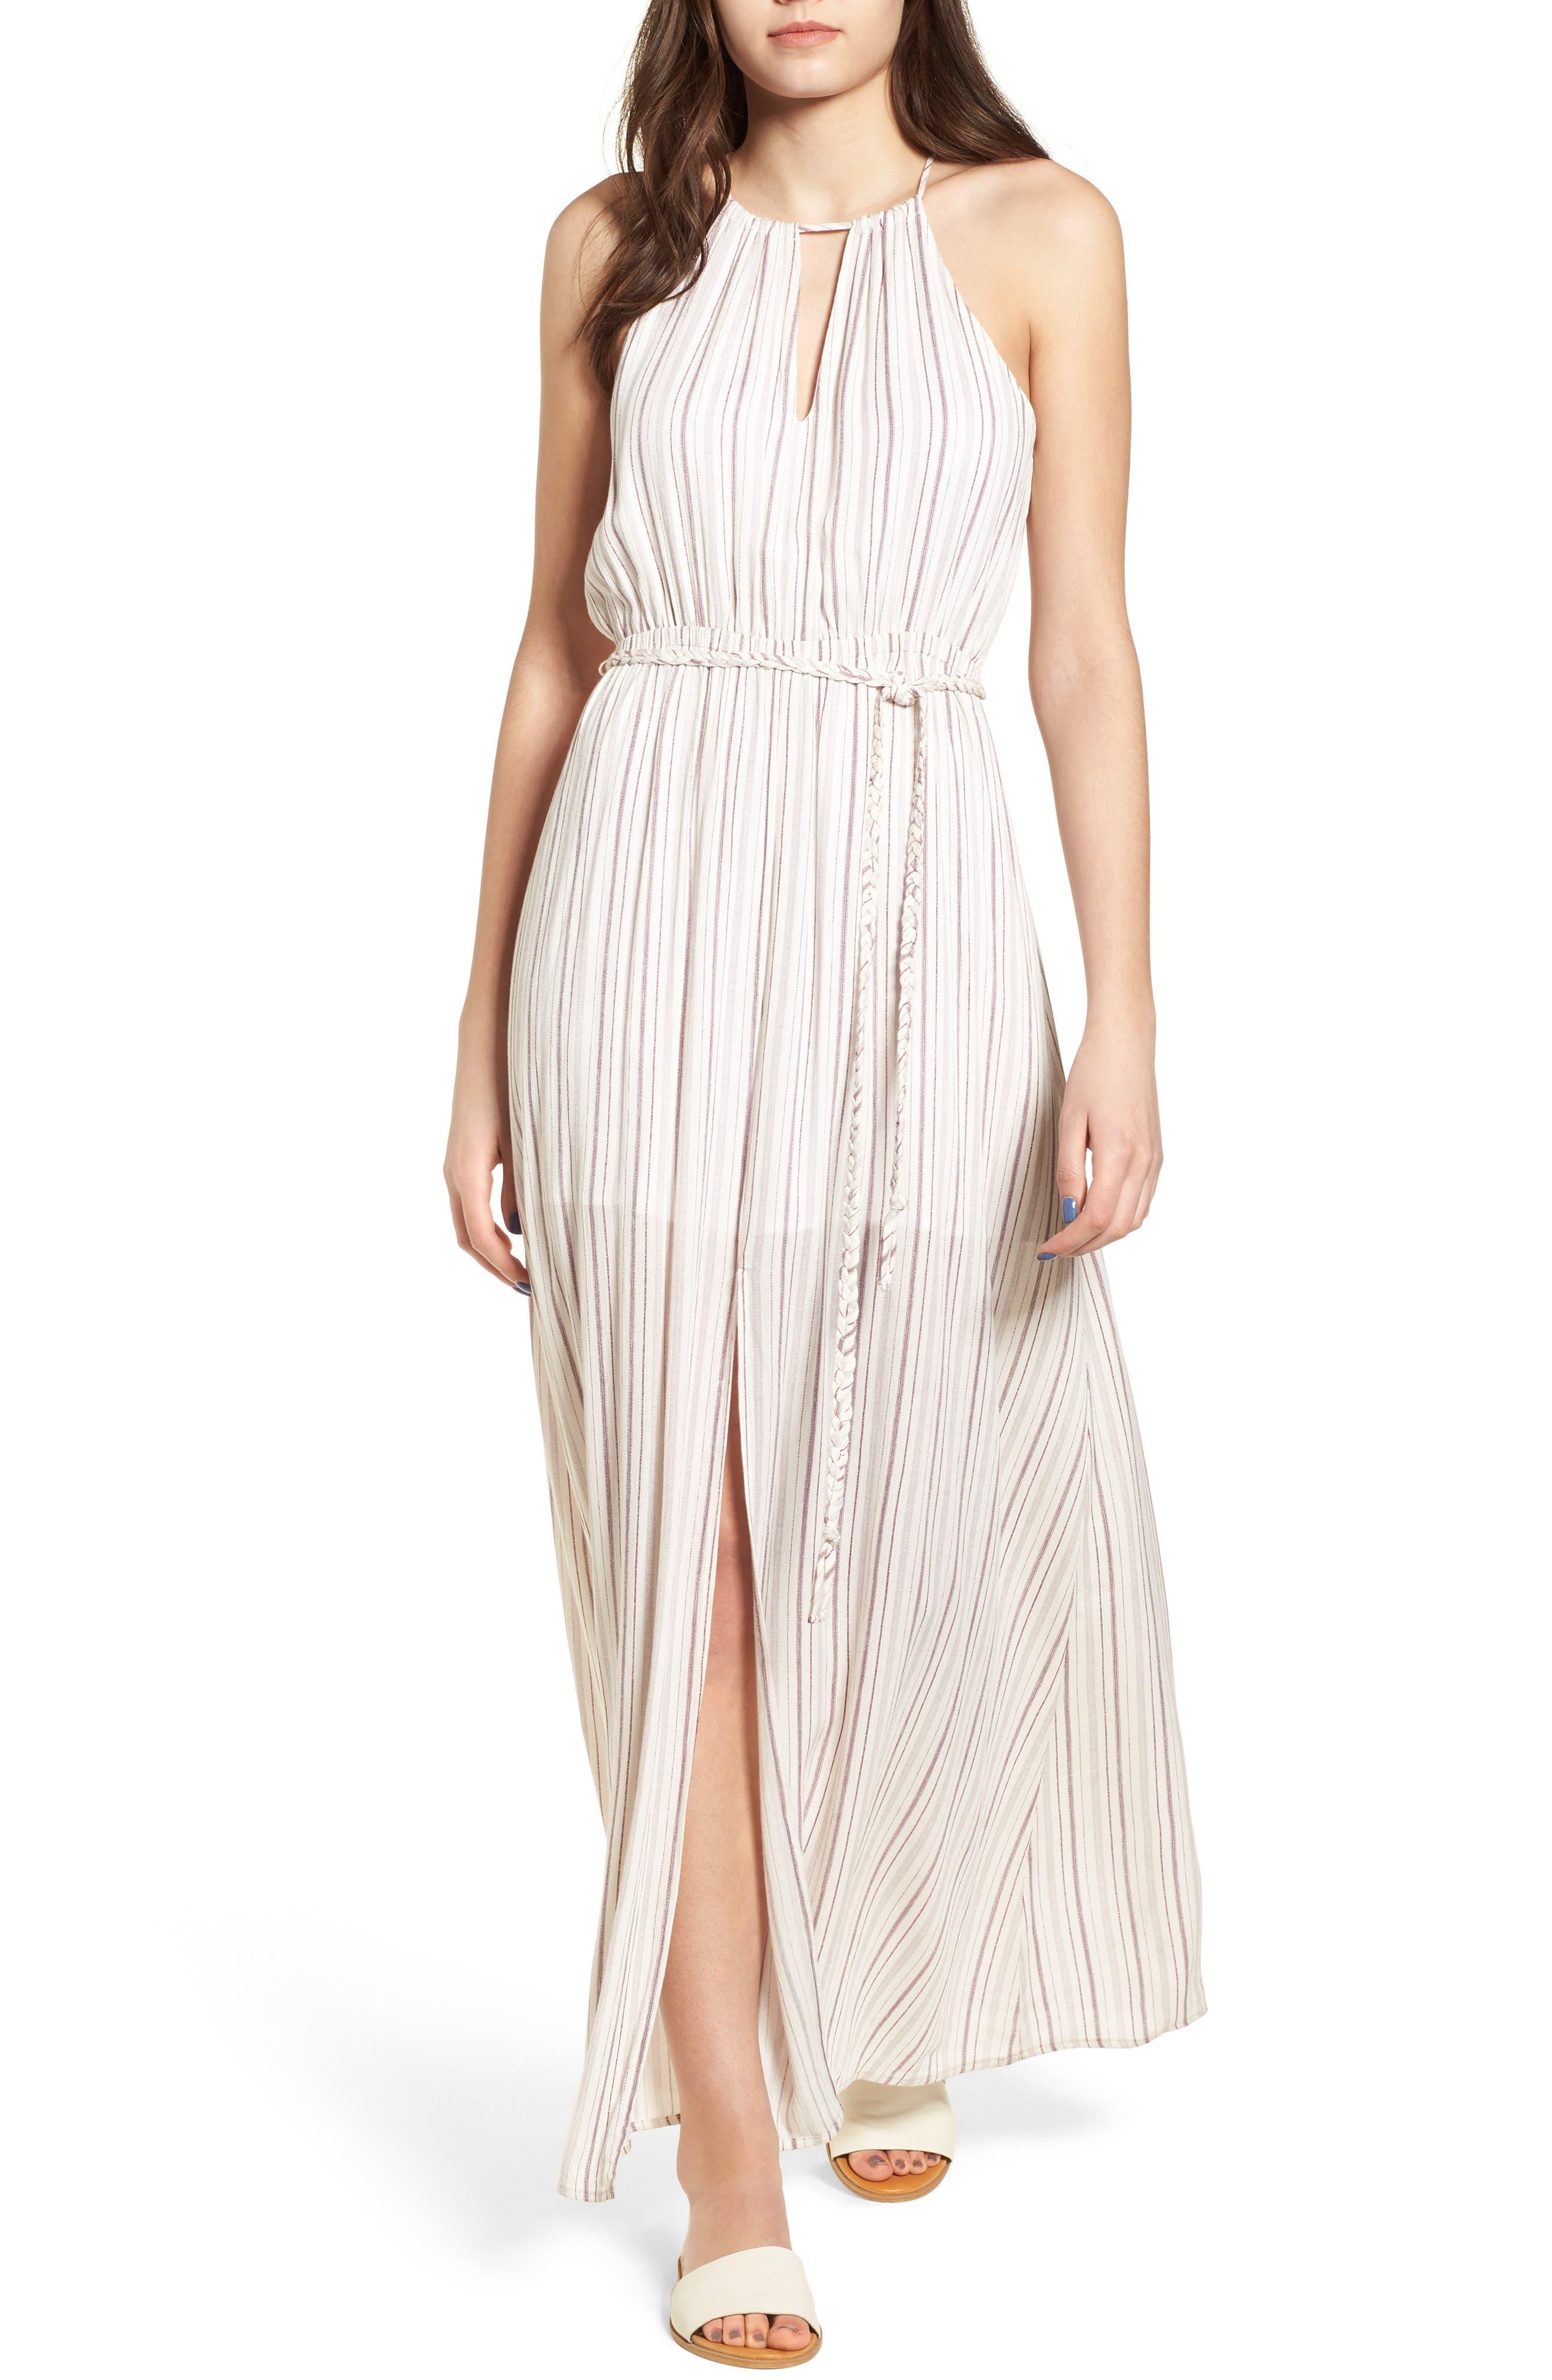 Daydreamer Stripe Maxi Dress,                             Main thumbnail 1, color,                             Ivory/ Mauve